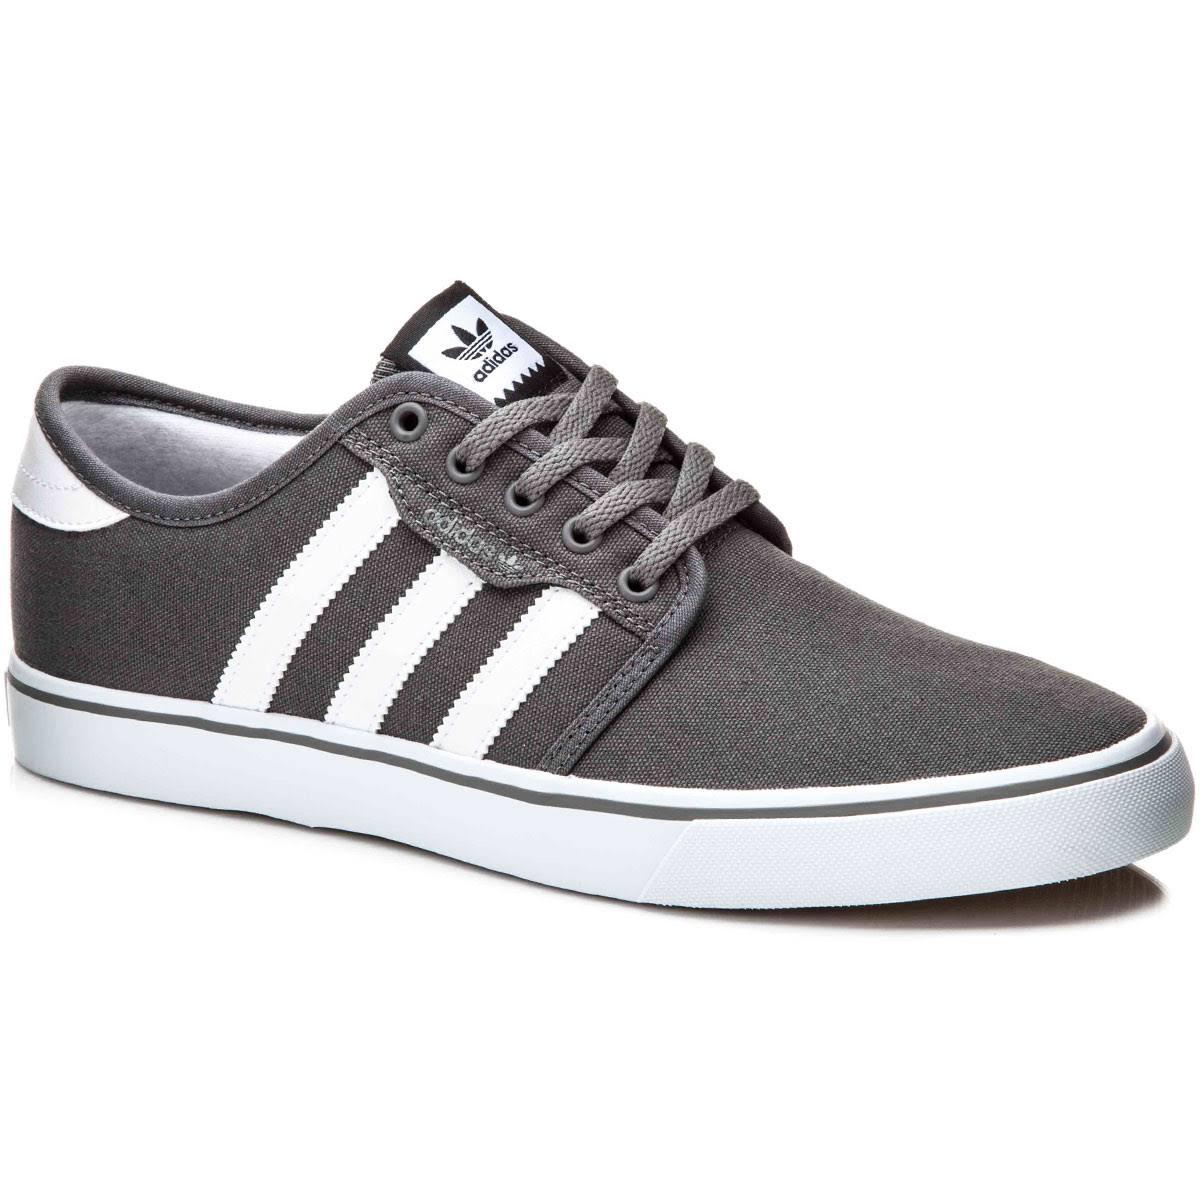 Cloud 6 Adidas Shoes Grey Men's Seeley White wRxBqZfnv